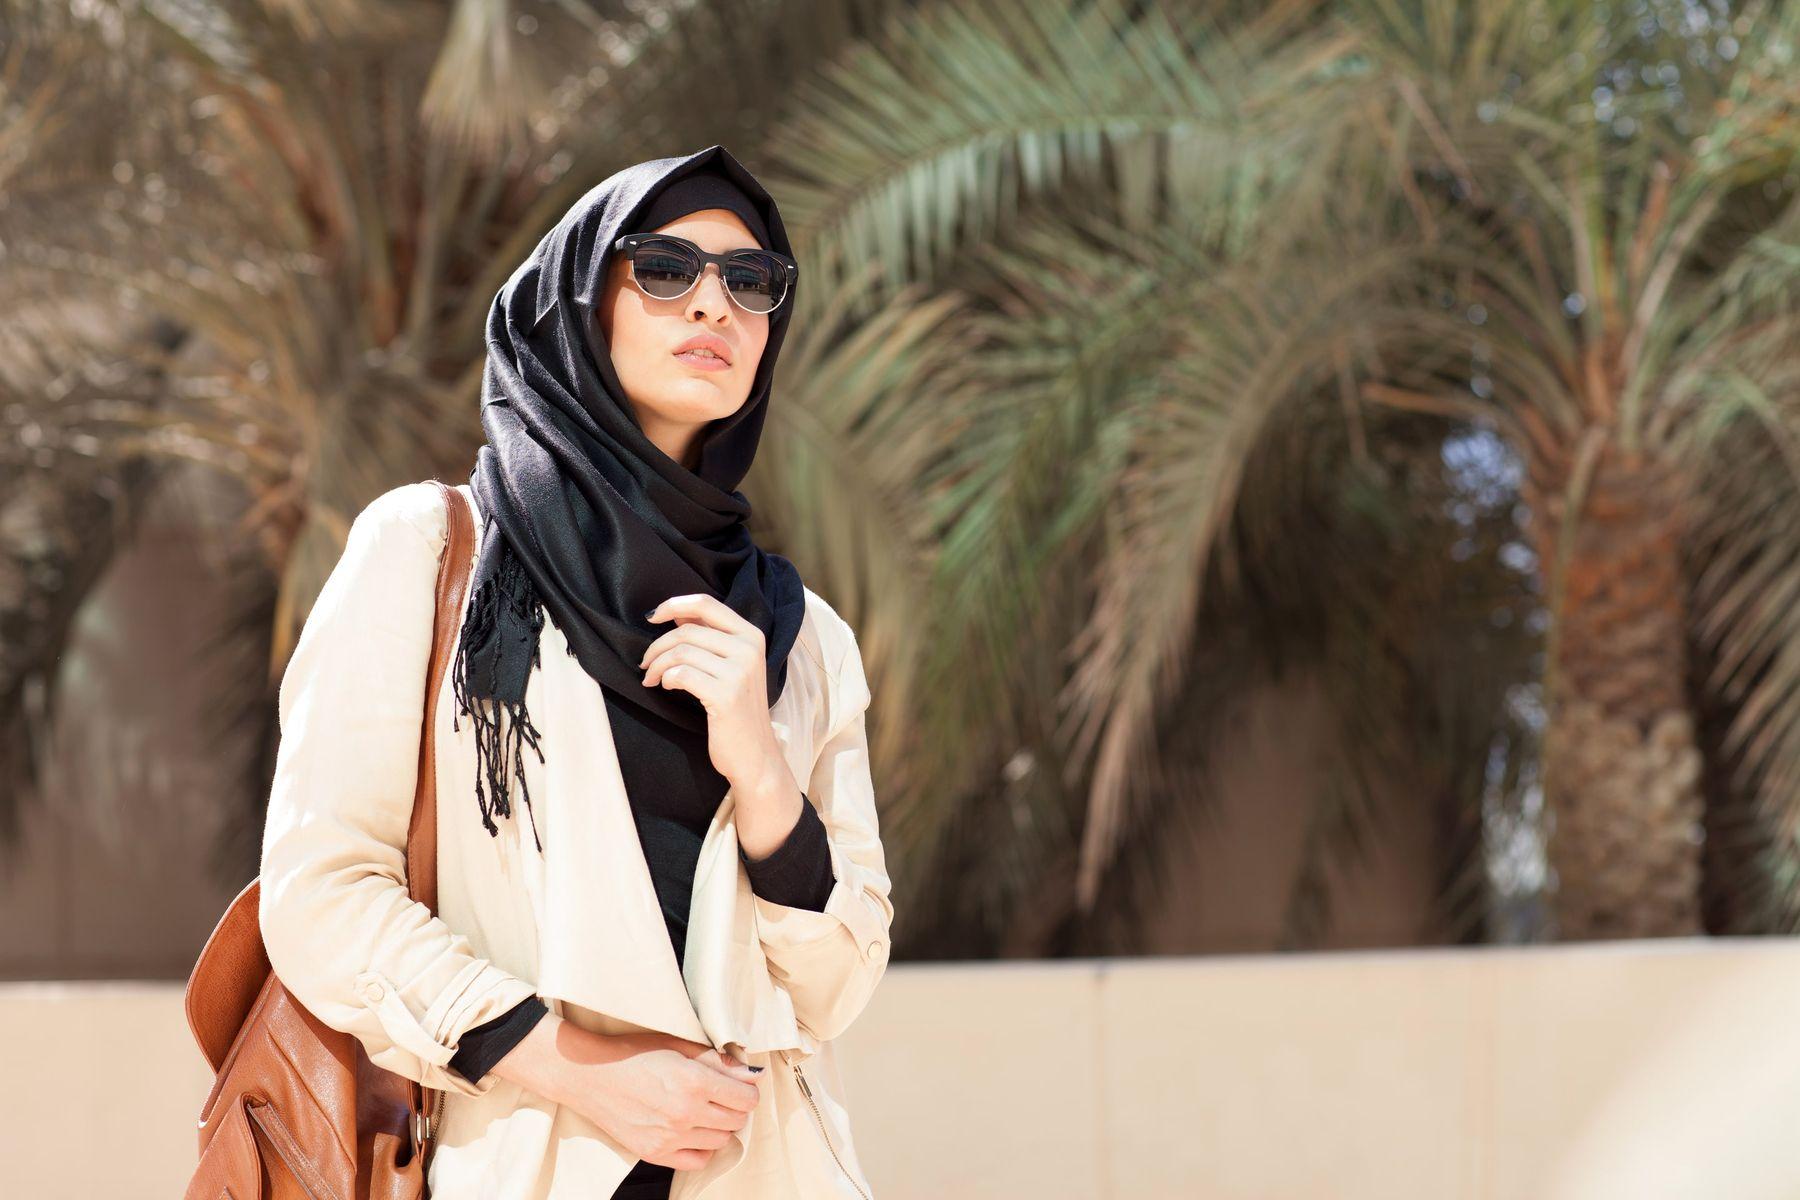 Mengenal Berbagai Model dan Cara Merawat Jilbab Instan